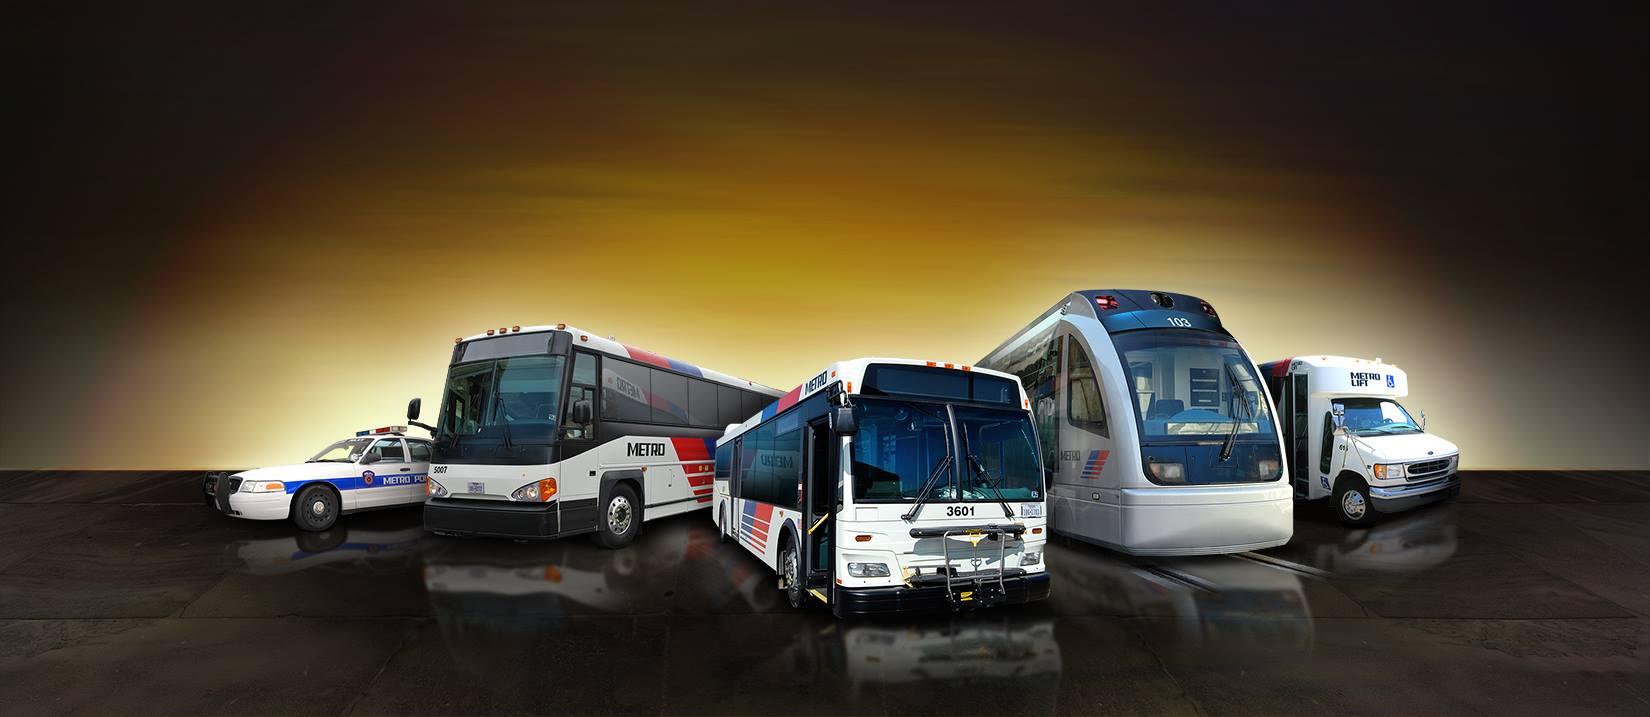 Alert 6 Limited Metrolift Service To Resume Houston